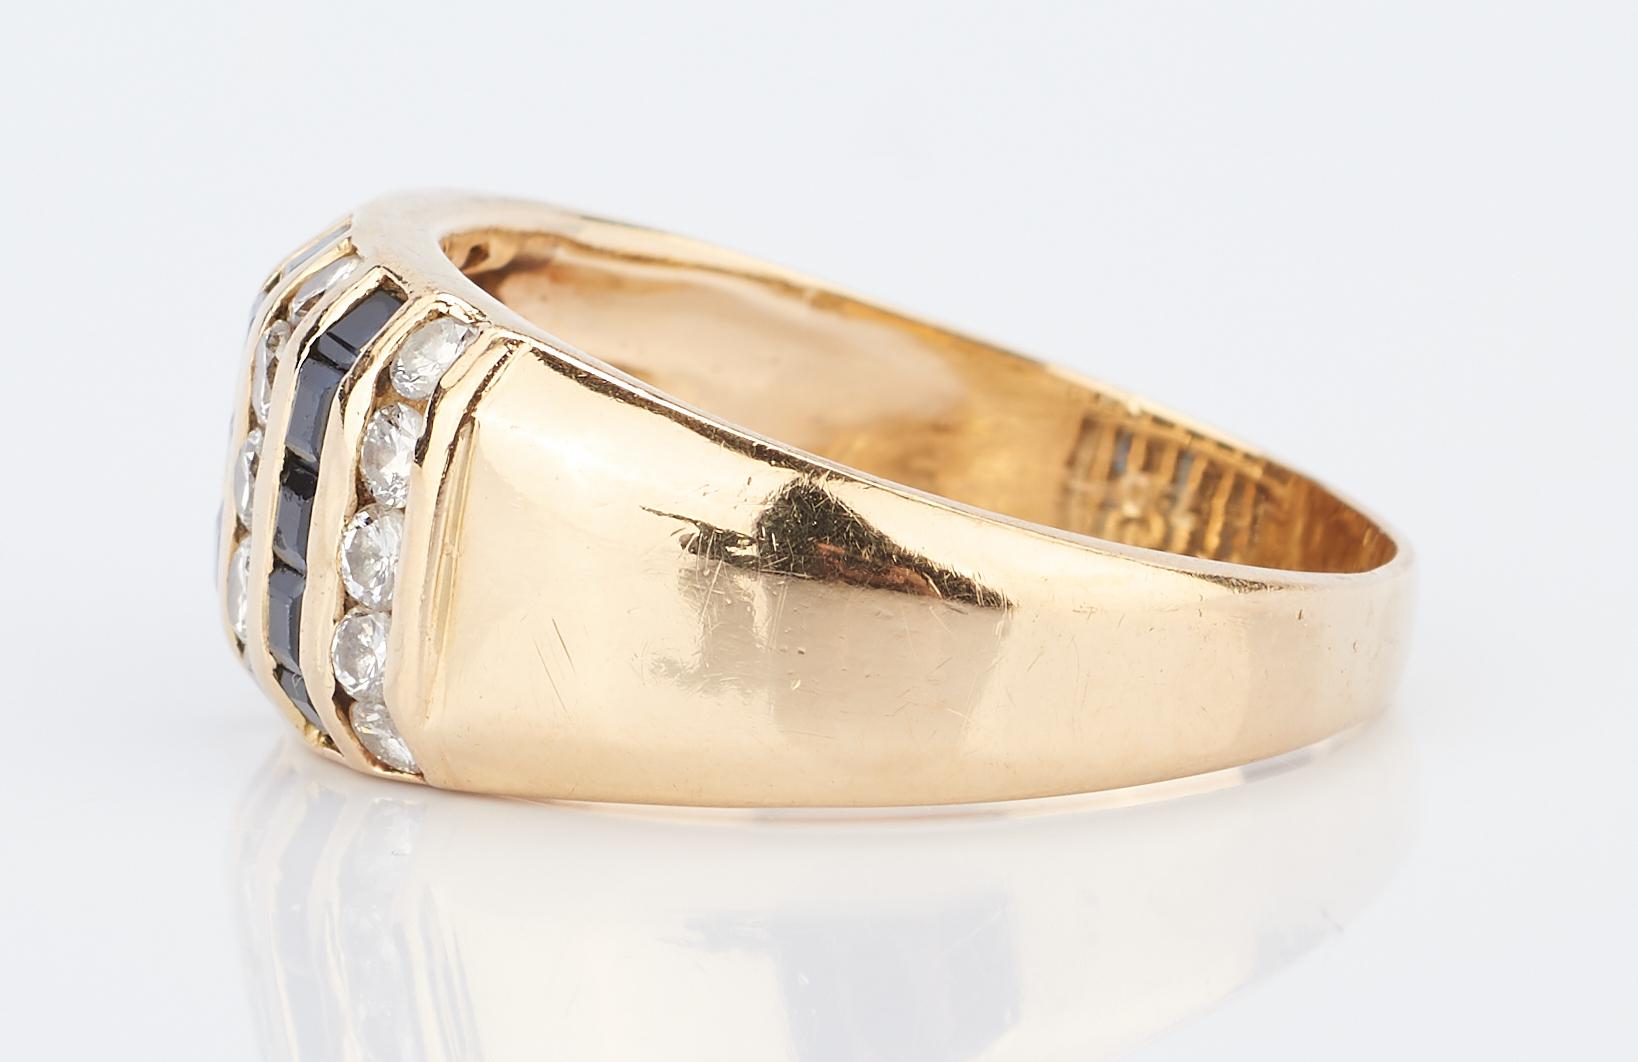 Lot 935: 4 Jewelry Items: 2 Rings & 2 Cross Pendants